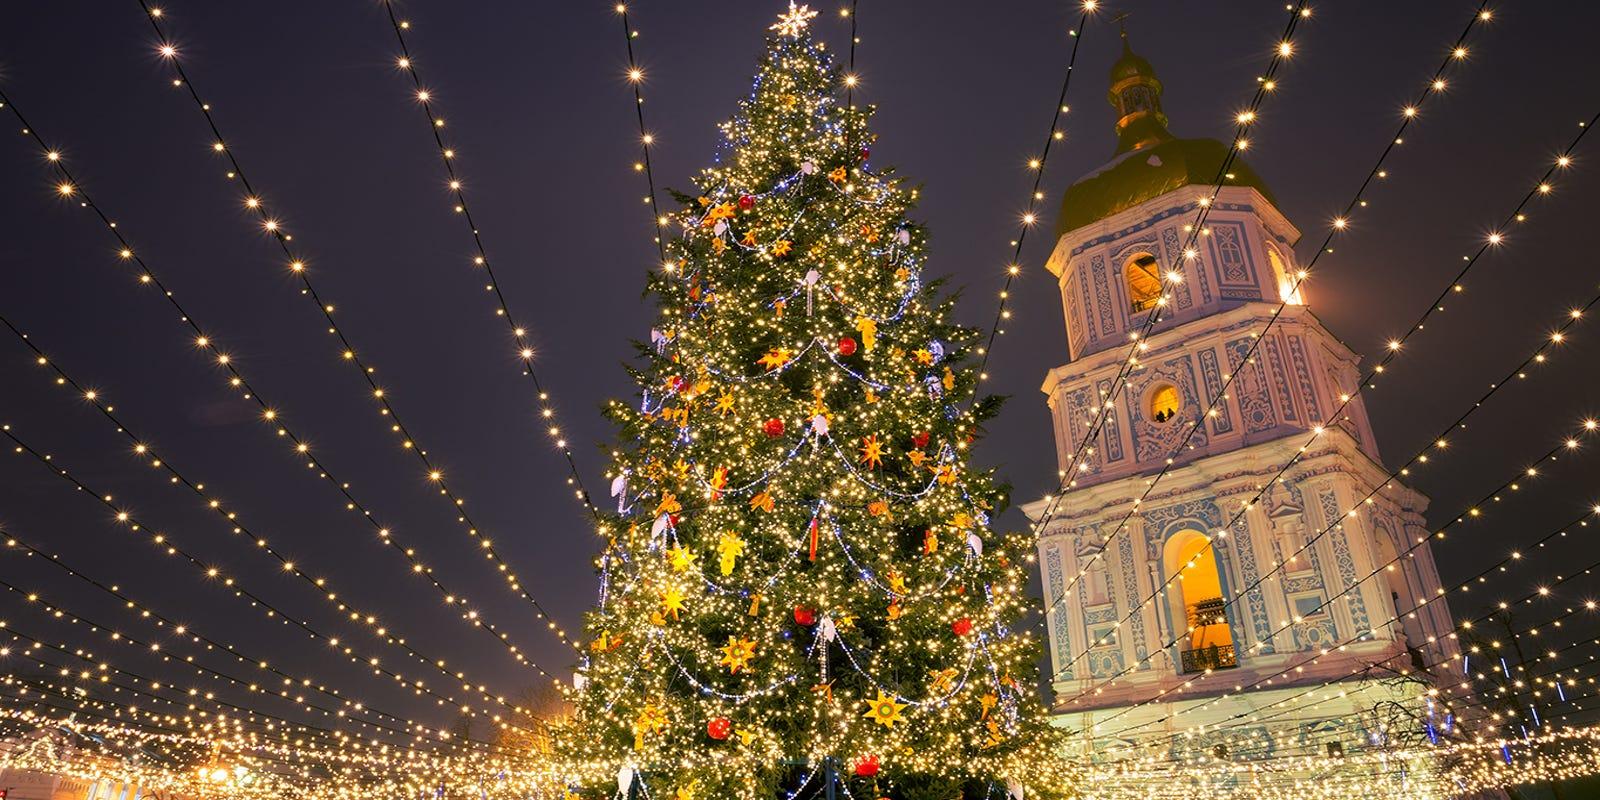 25 stunning Christmas light displays around the world